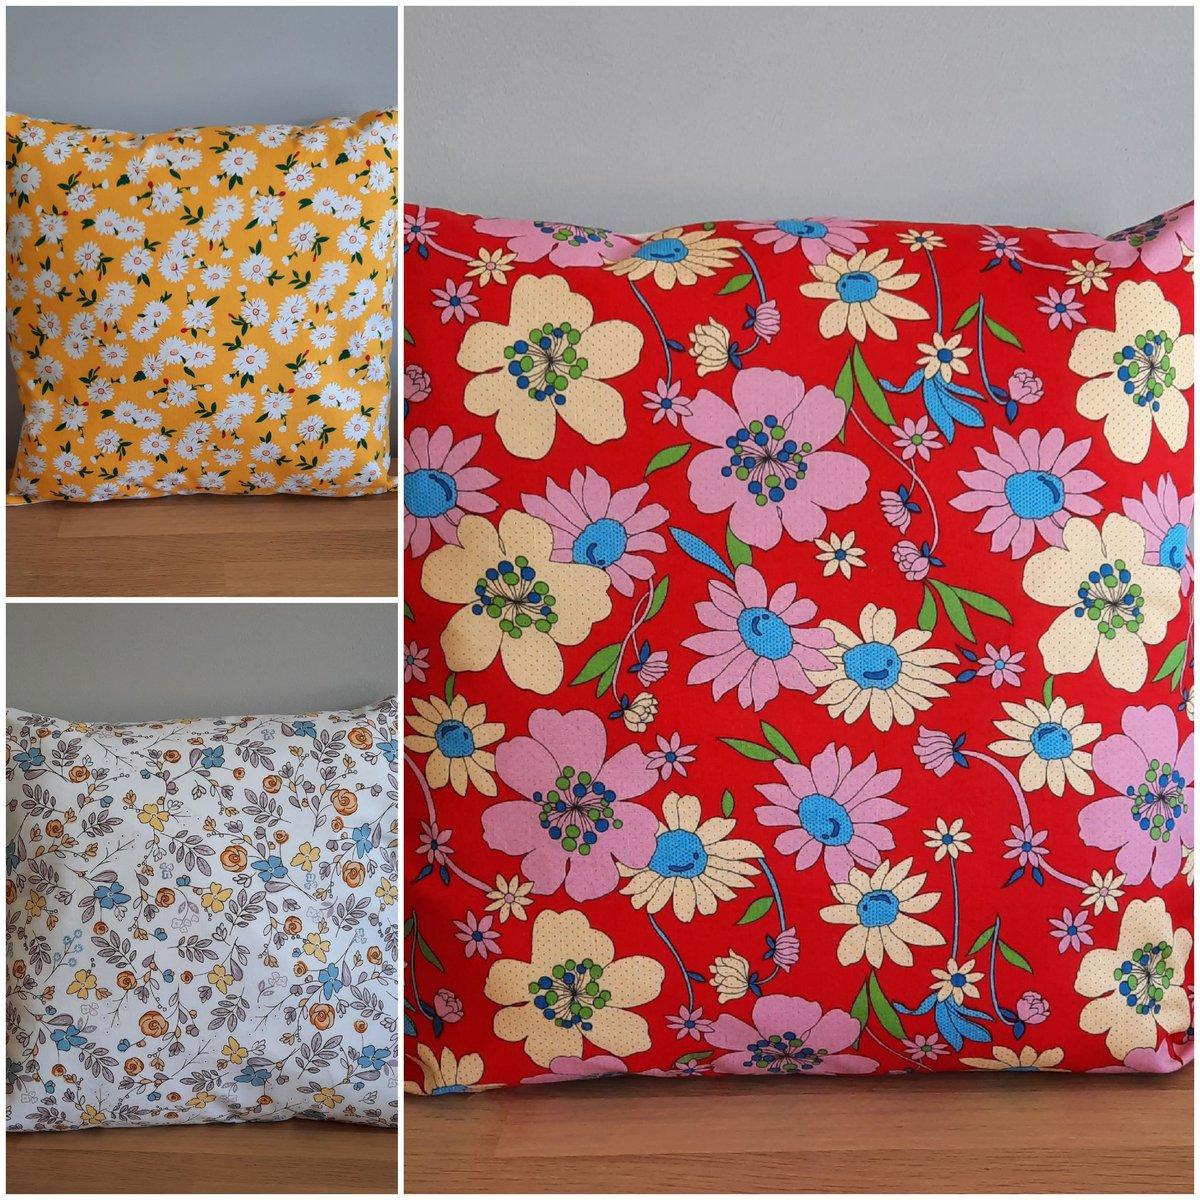 Loads of designs and colours to brighten your #homedecor  #handmadeinscotland #handmadeinuk #handmade #etsy #giftidea  #inbizhour  https://t.co/L9Abq6Ms2z https://t.co/8JrOJm7i2F